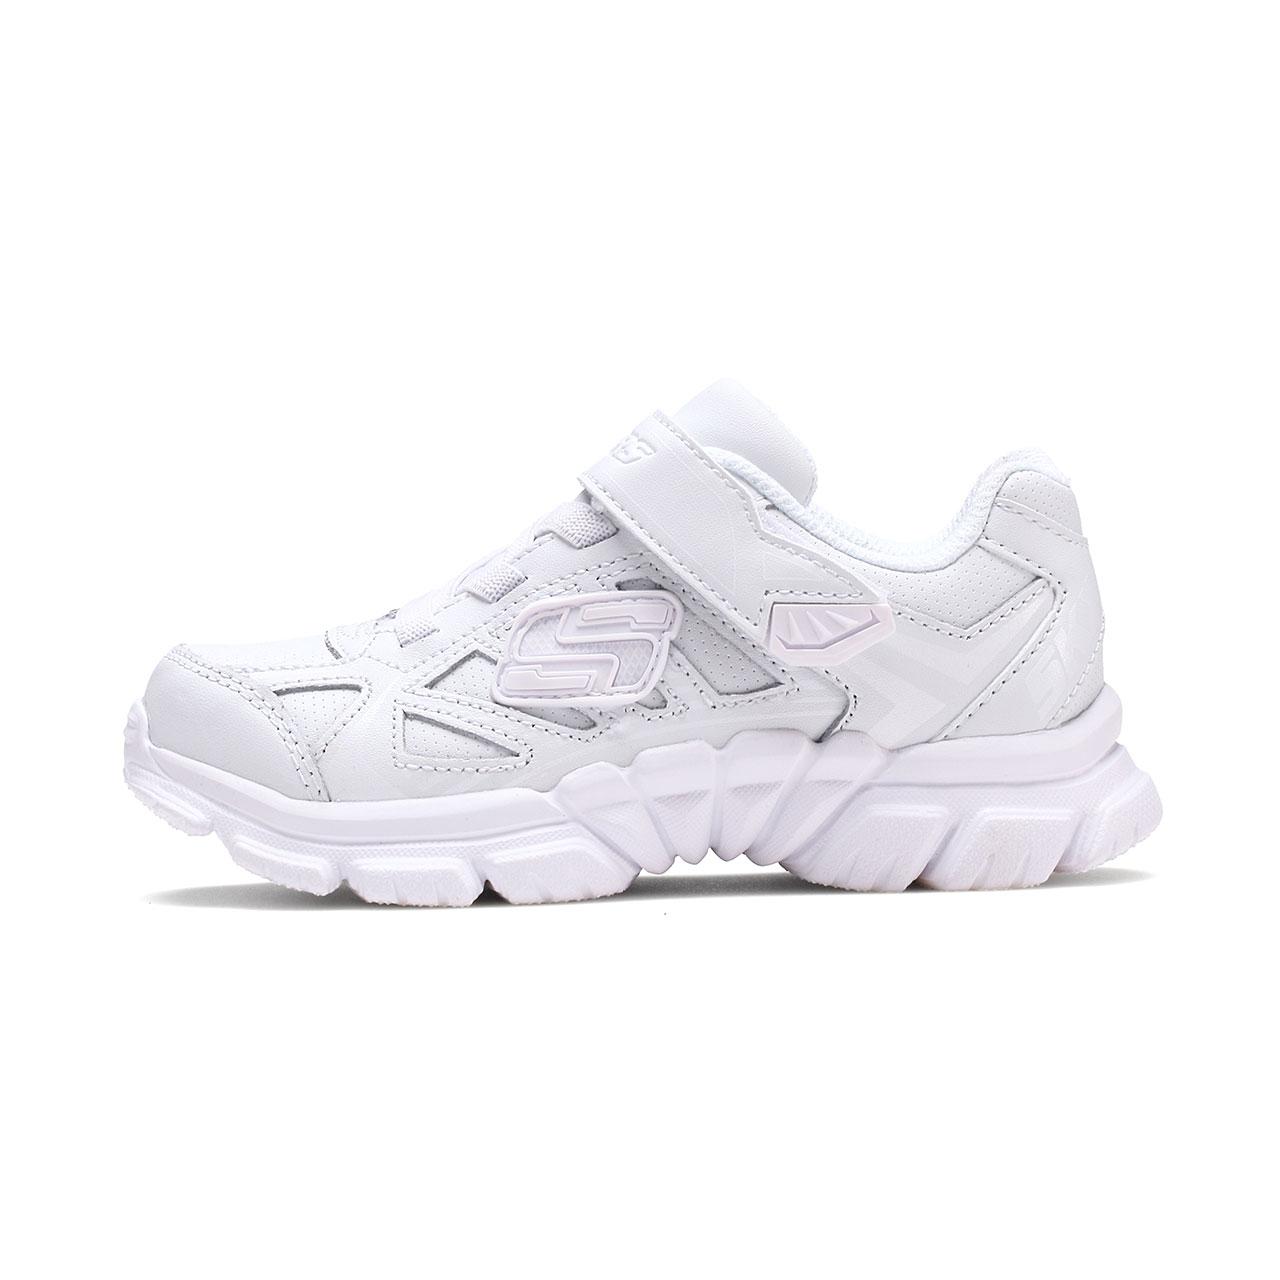 Skechers斯凯奇官方正品男女儿童软底舒适小白鞋运动鞋 998095L